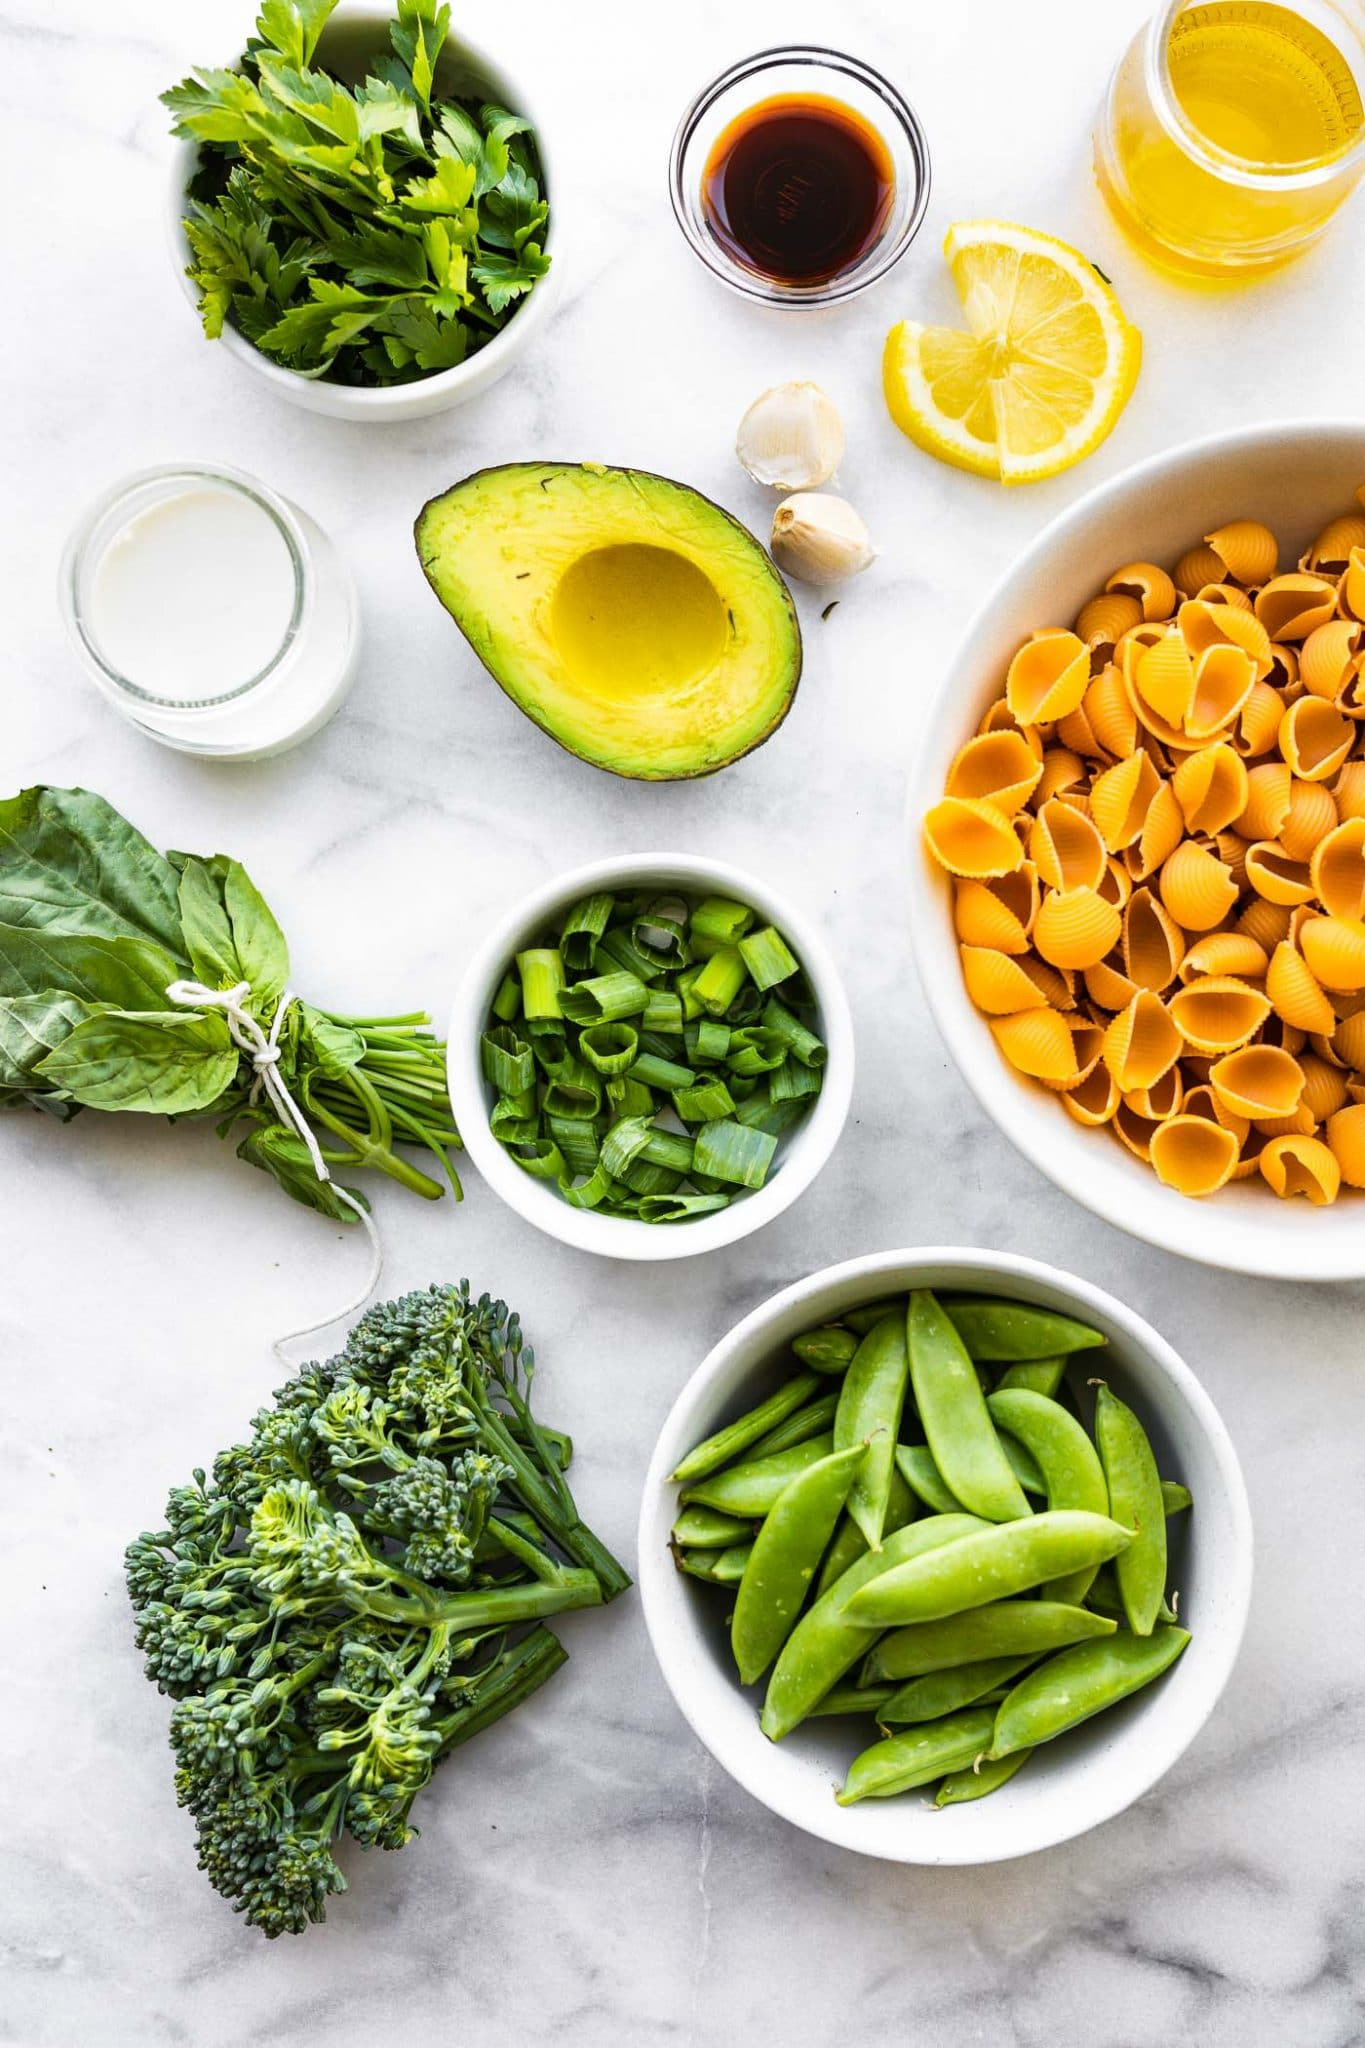 Ingredients for Green Goddess Pasta Salad